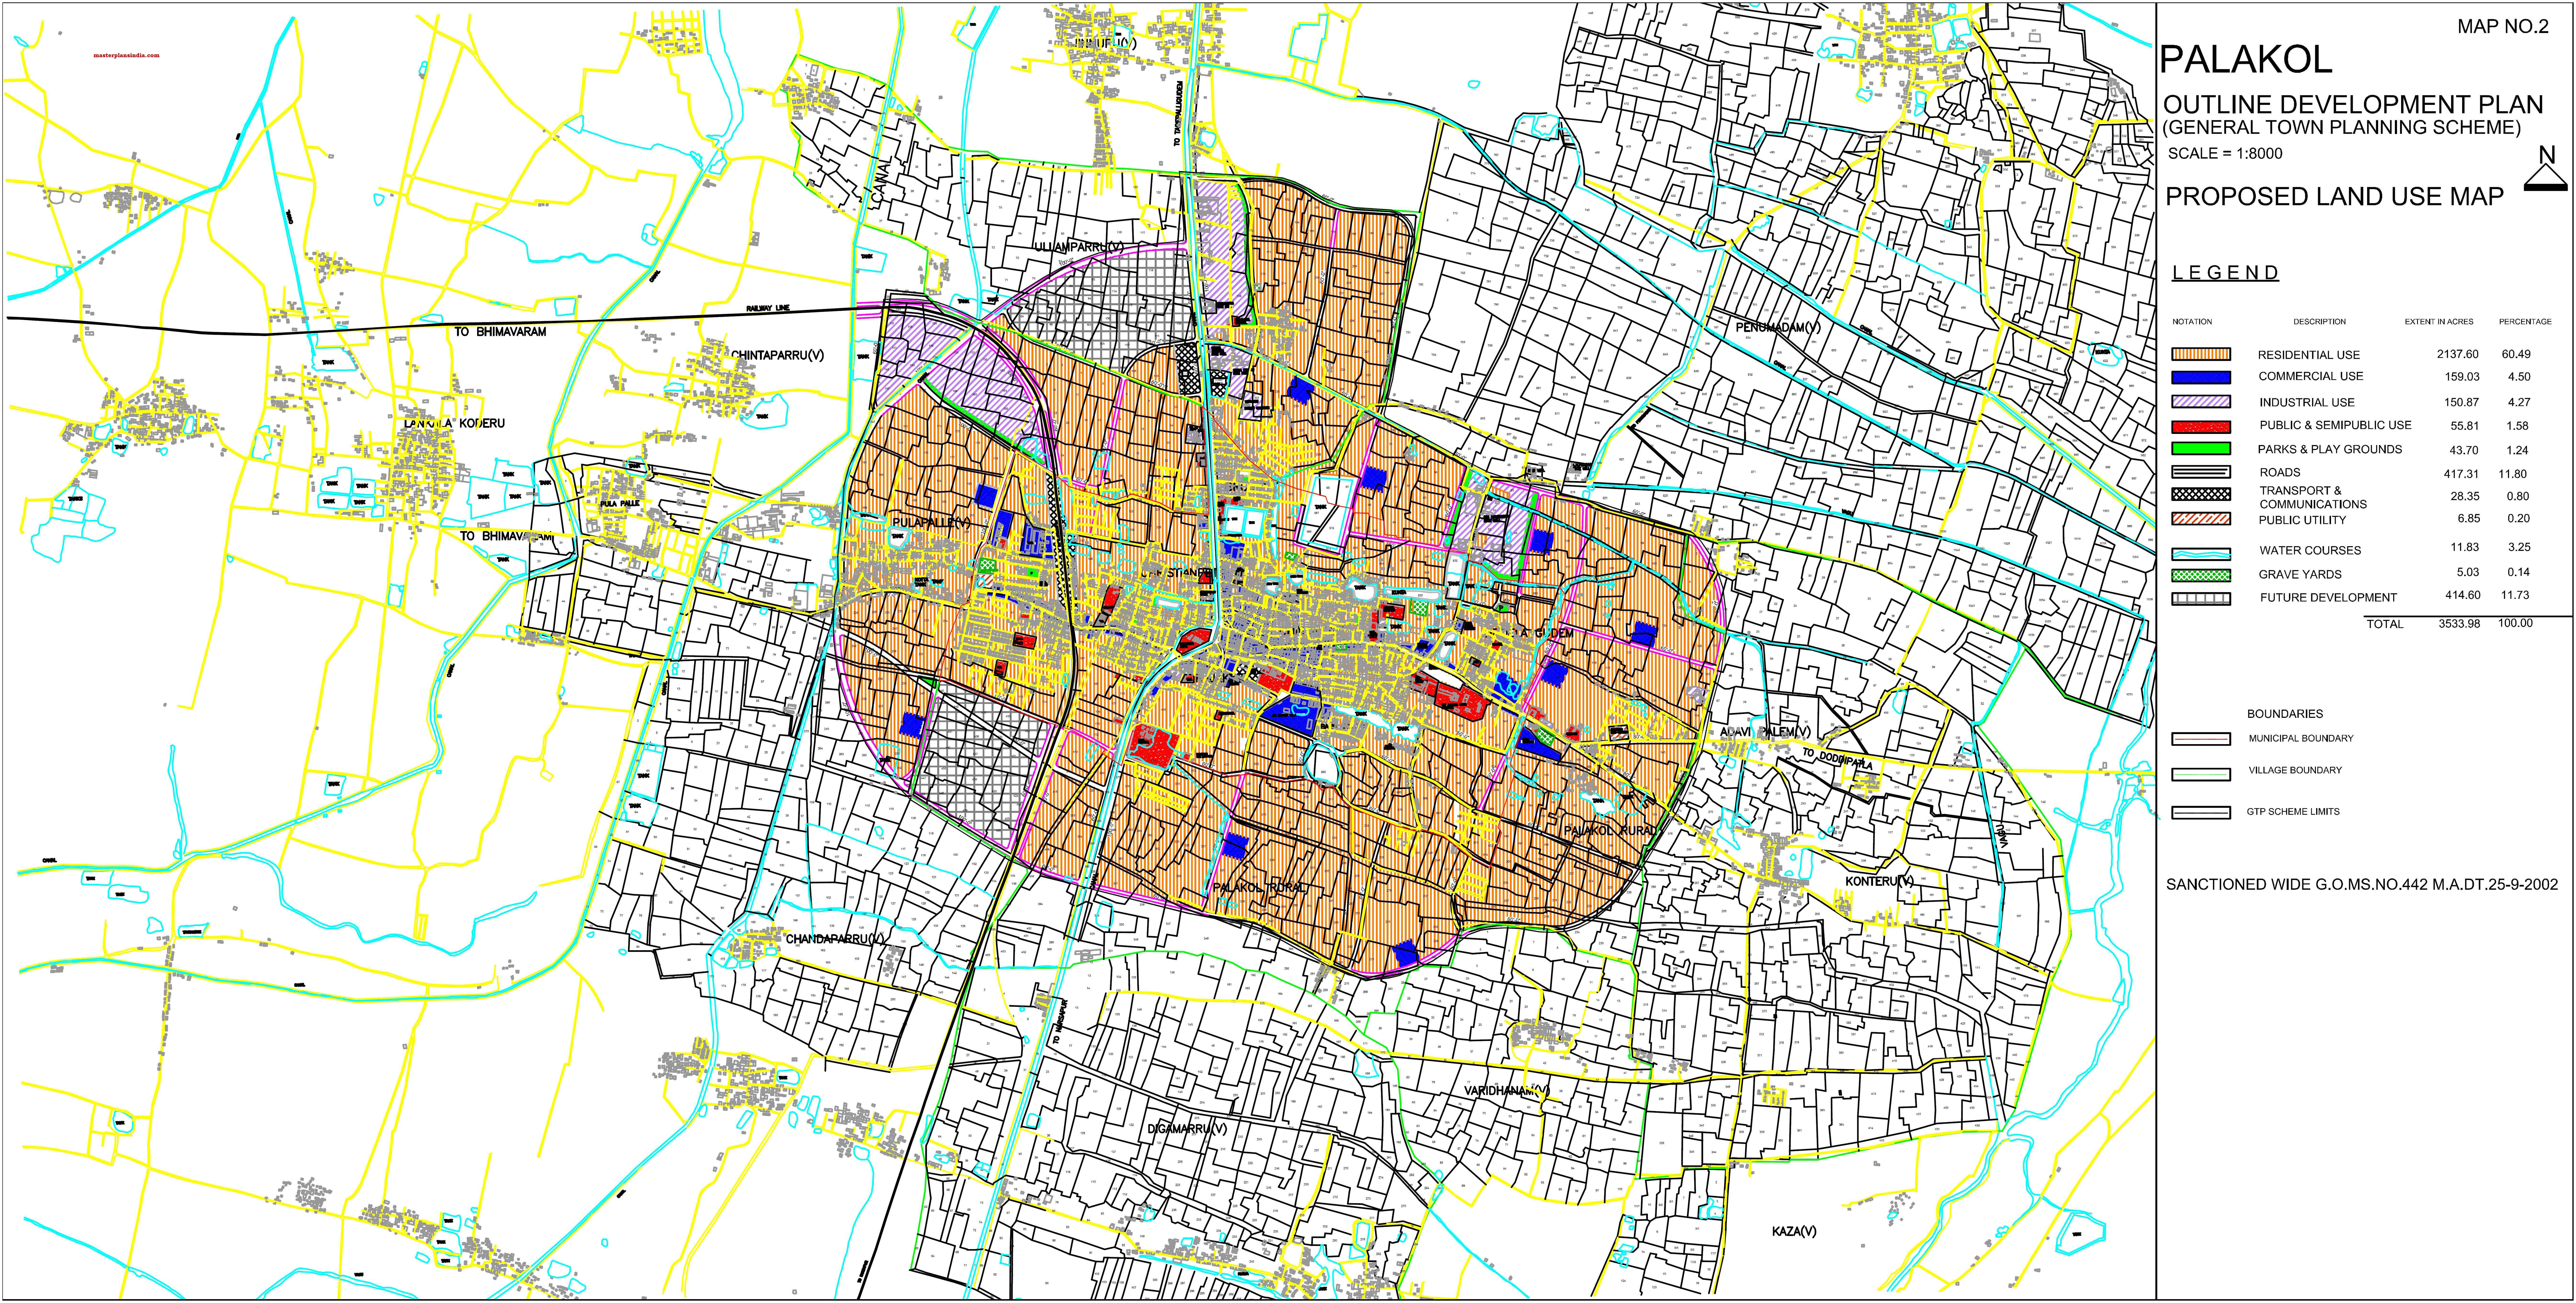 palakol-master-development-plan-map Janani Suraksha Yojana Application Form Download on